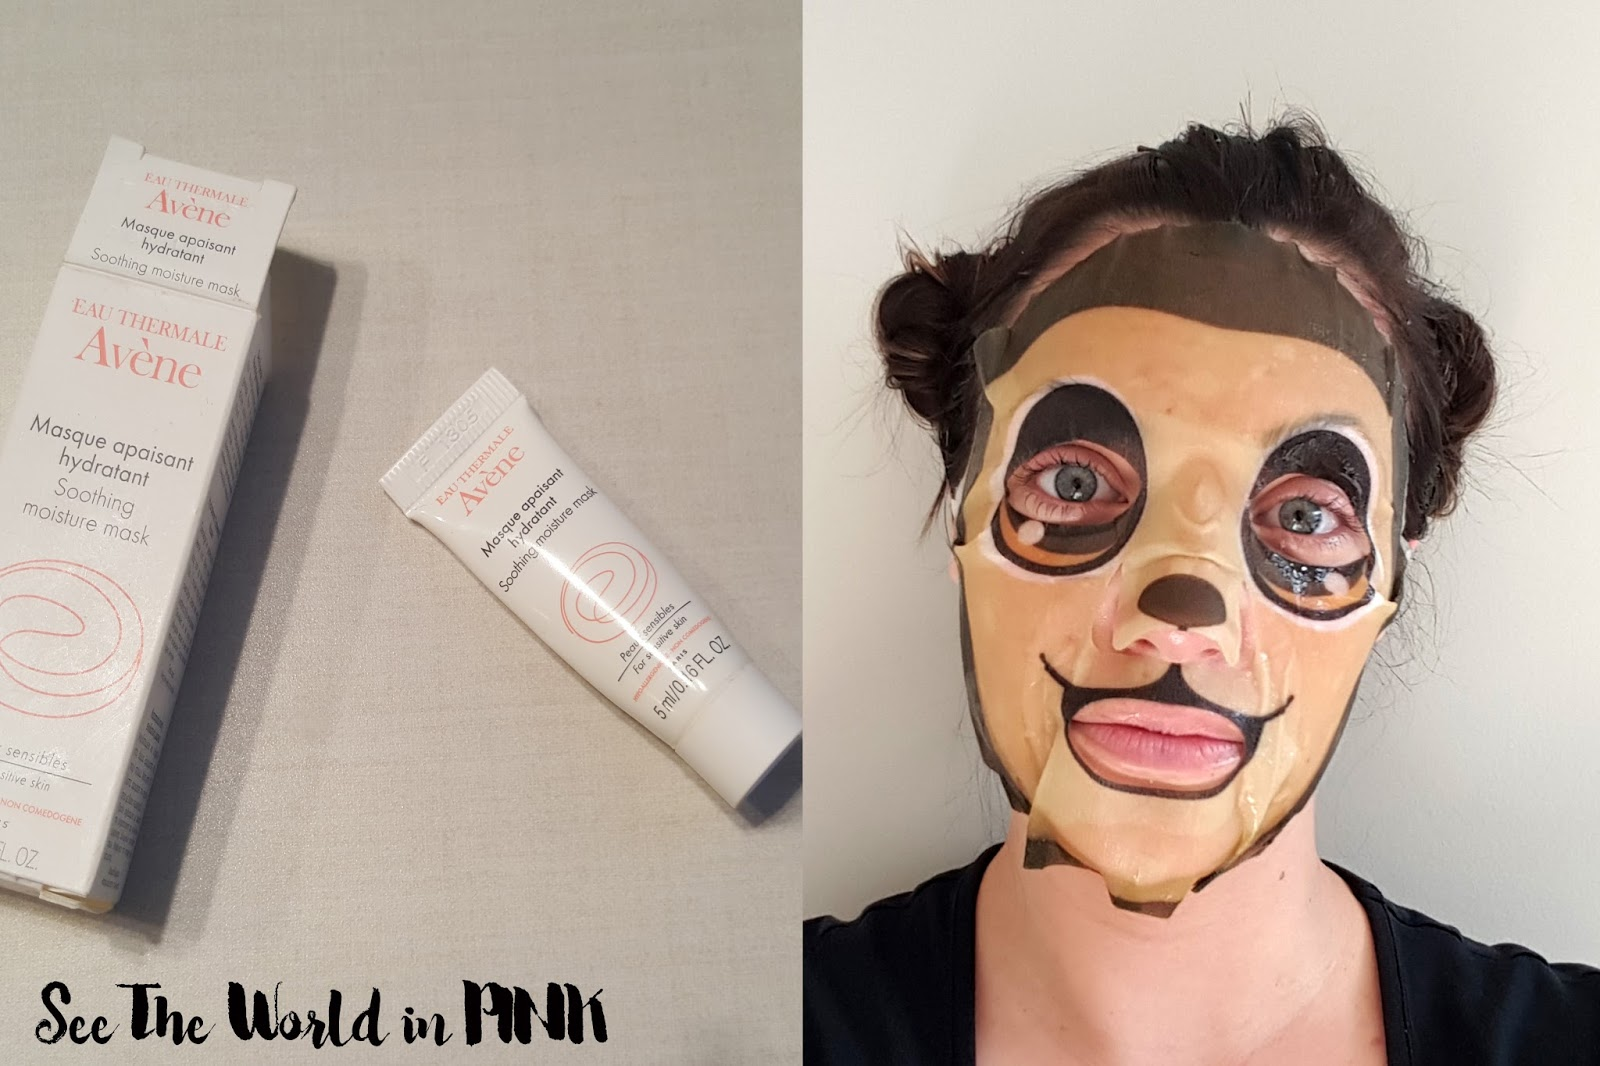 avene eau thermale soothing moisture mask thefaceshop character mask monkey